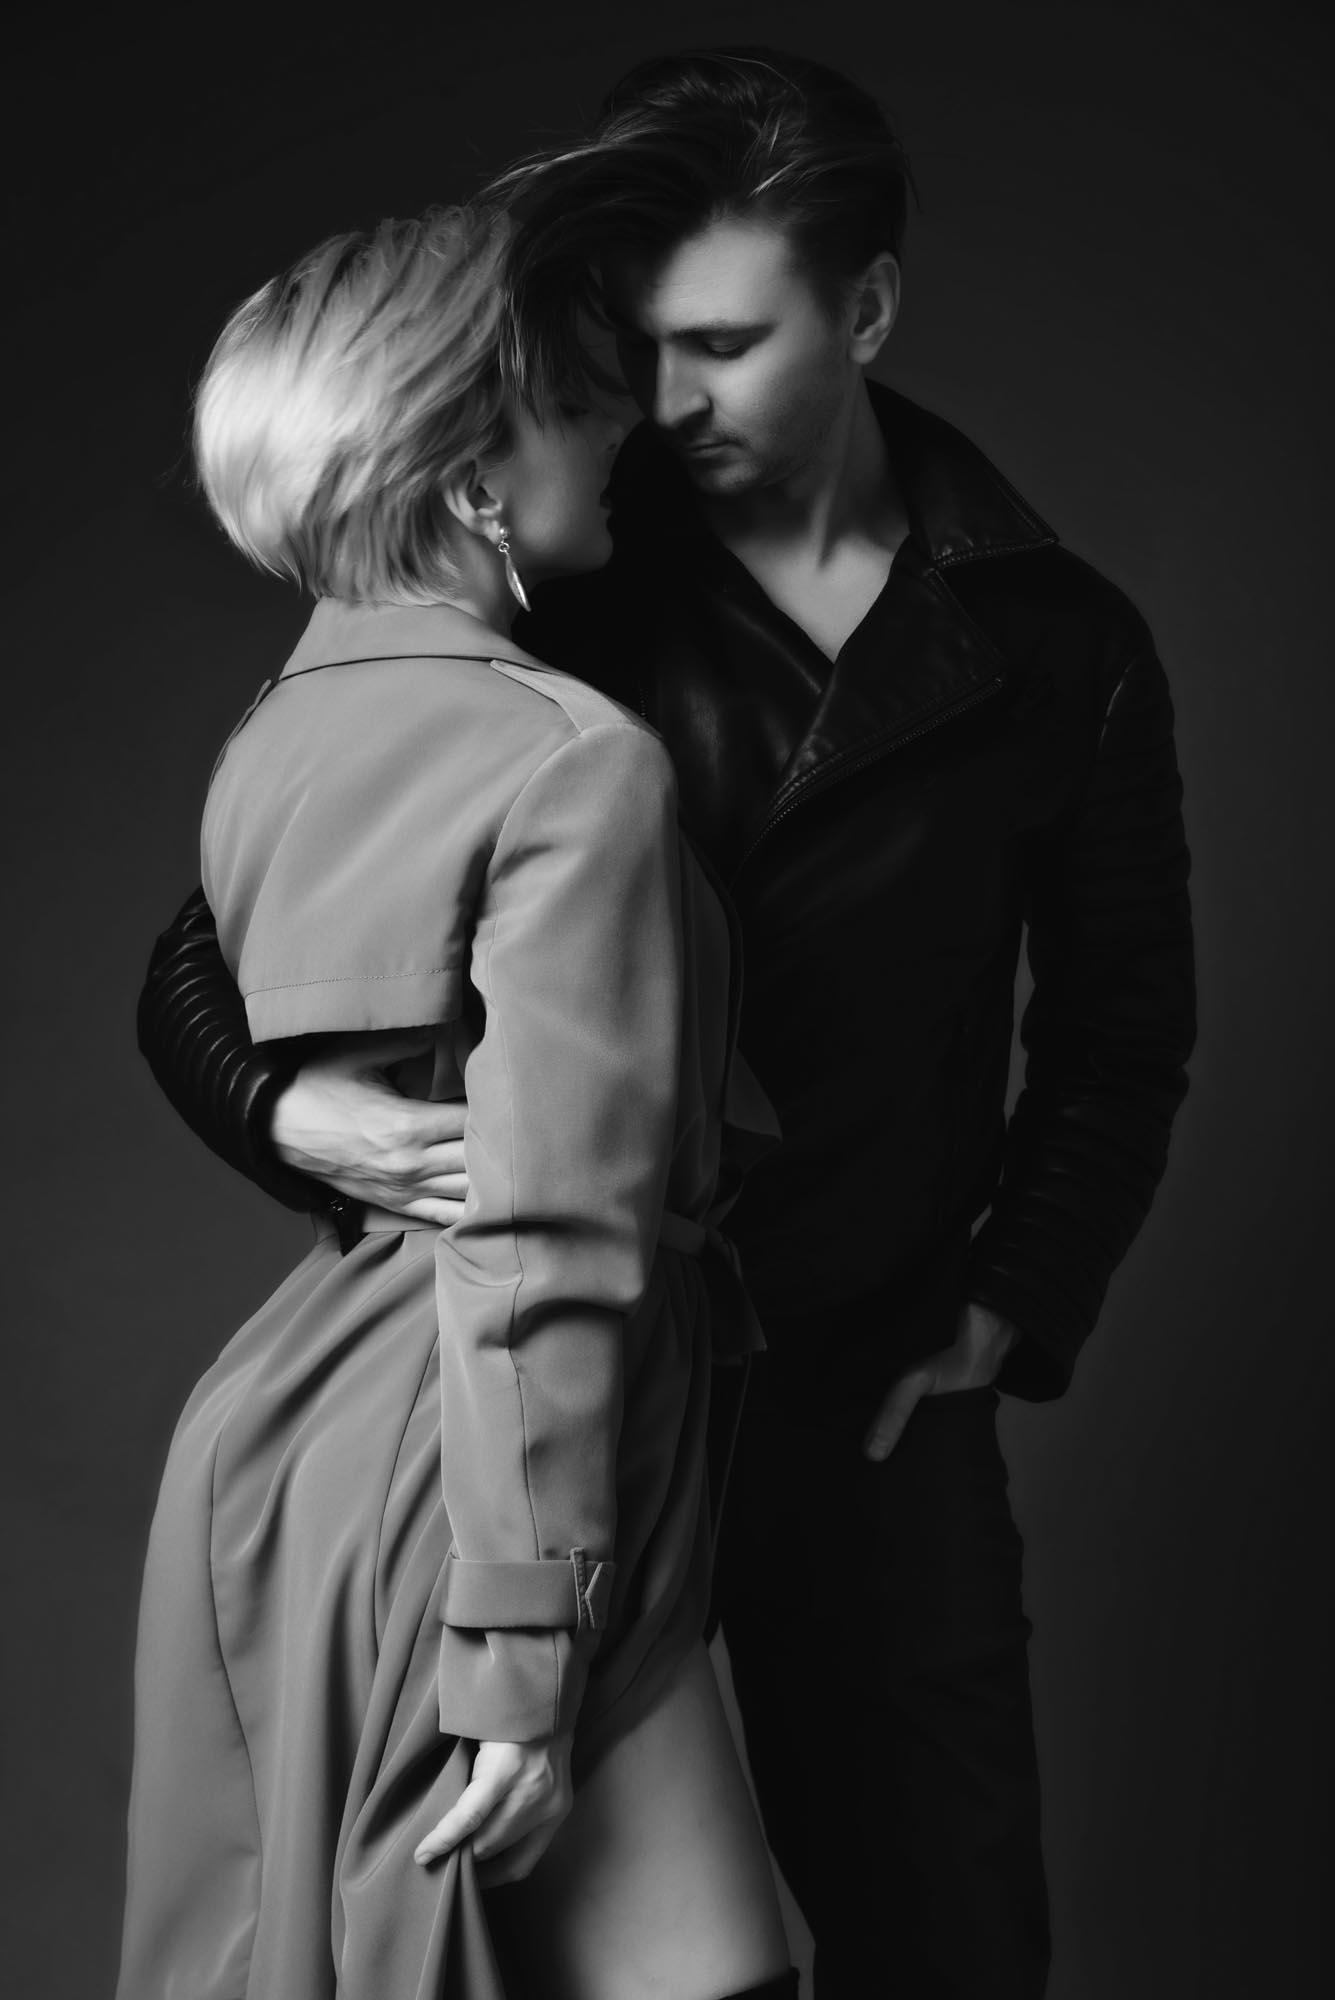 nyc-photographers-Love-Story-Photoshoot-10009.jpg